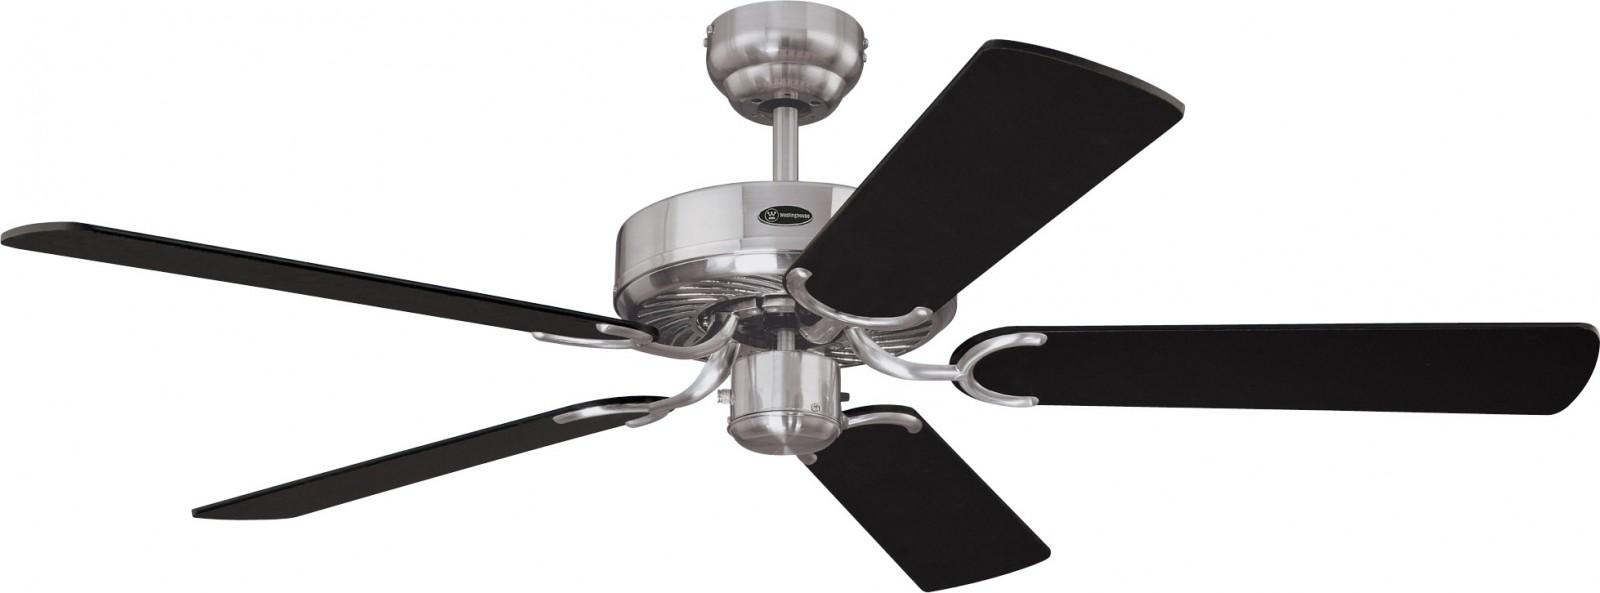 Westinghouse Ceiling Fan Cyclone Brushed Steel 132 Cm 52